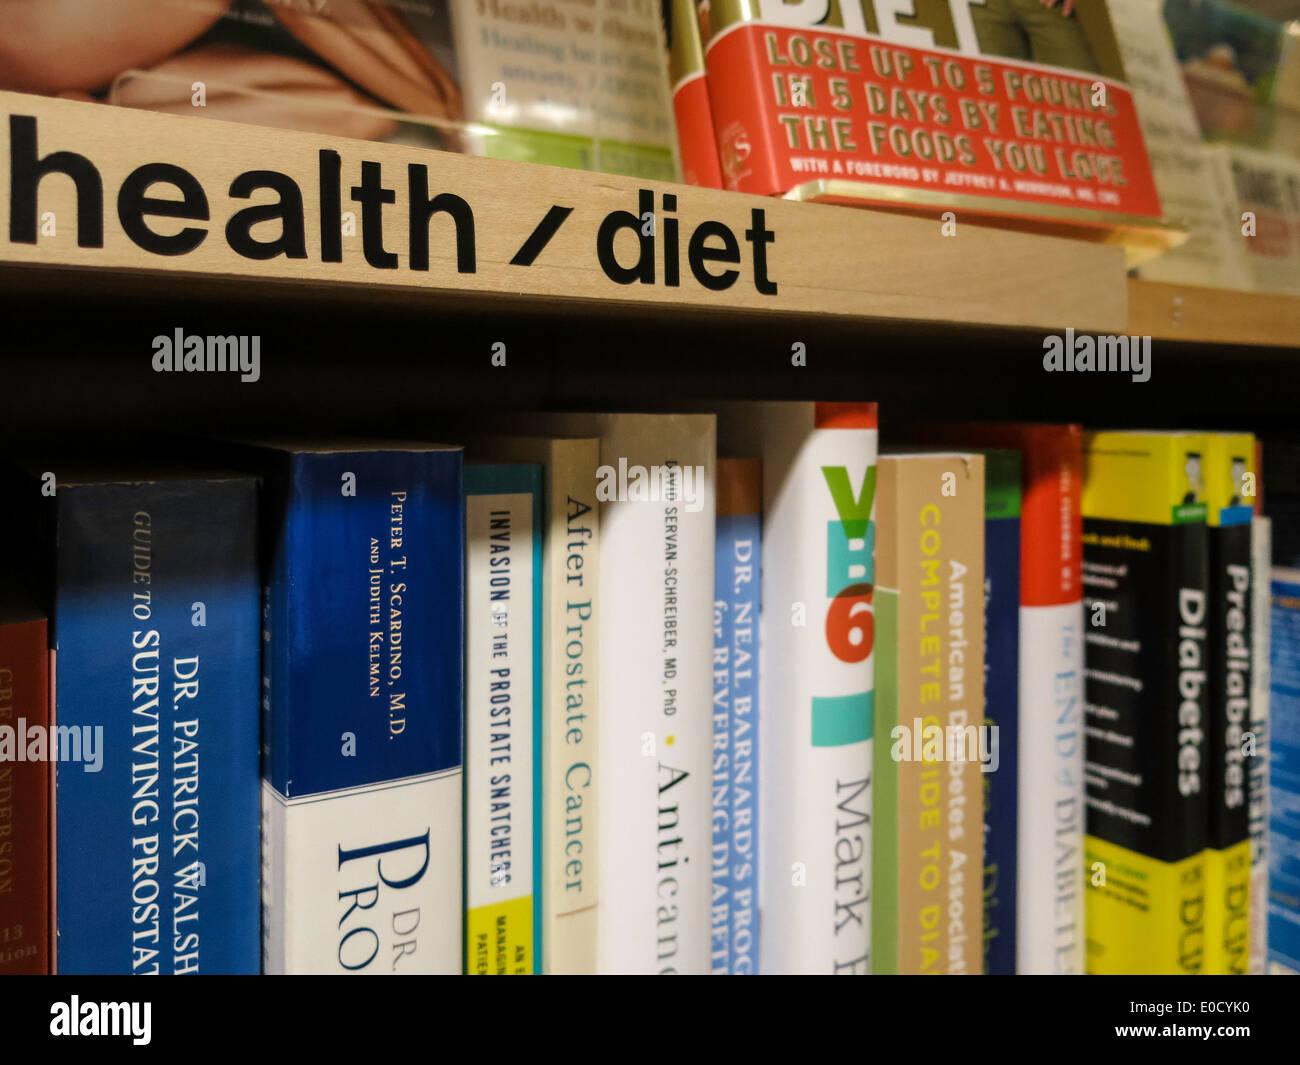 Diet Books Store Stock Photos & Diet Books Store Stock